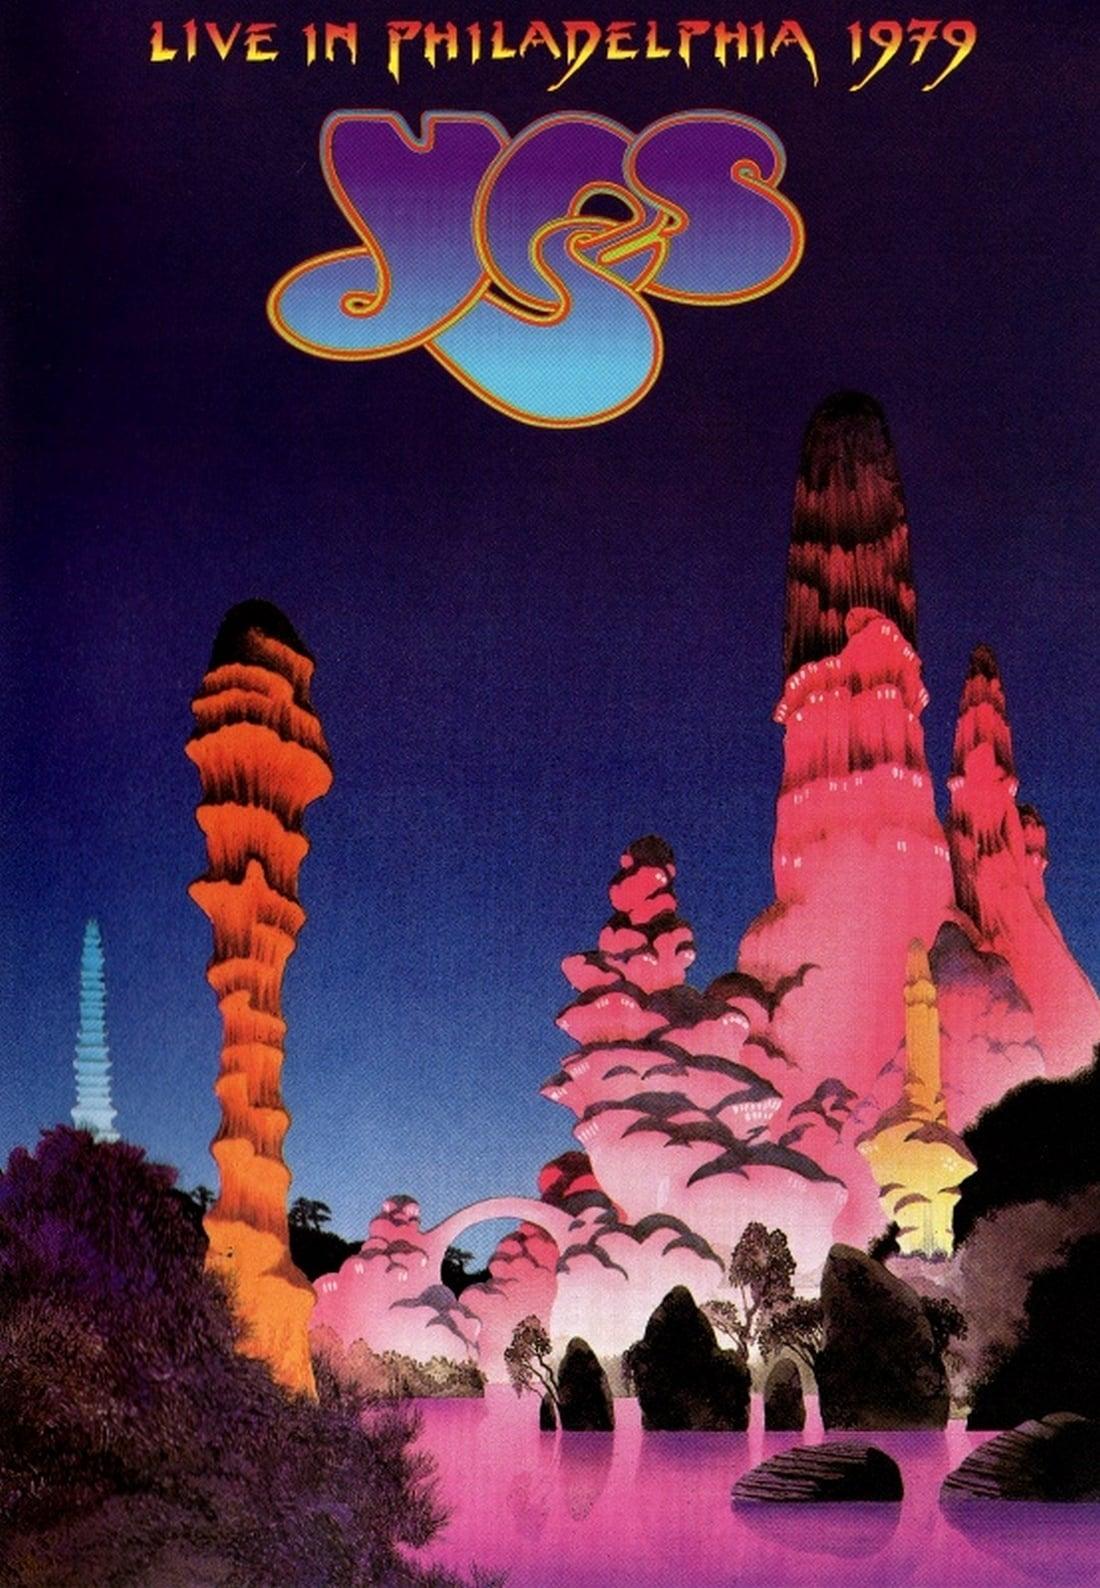 Yes: Live In Philadelphia 1979